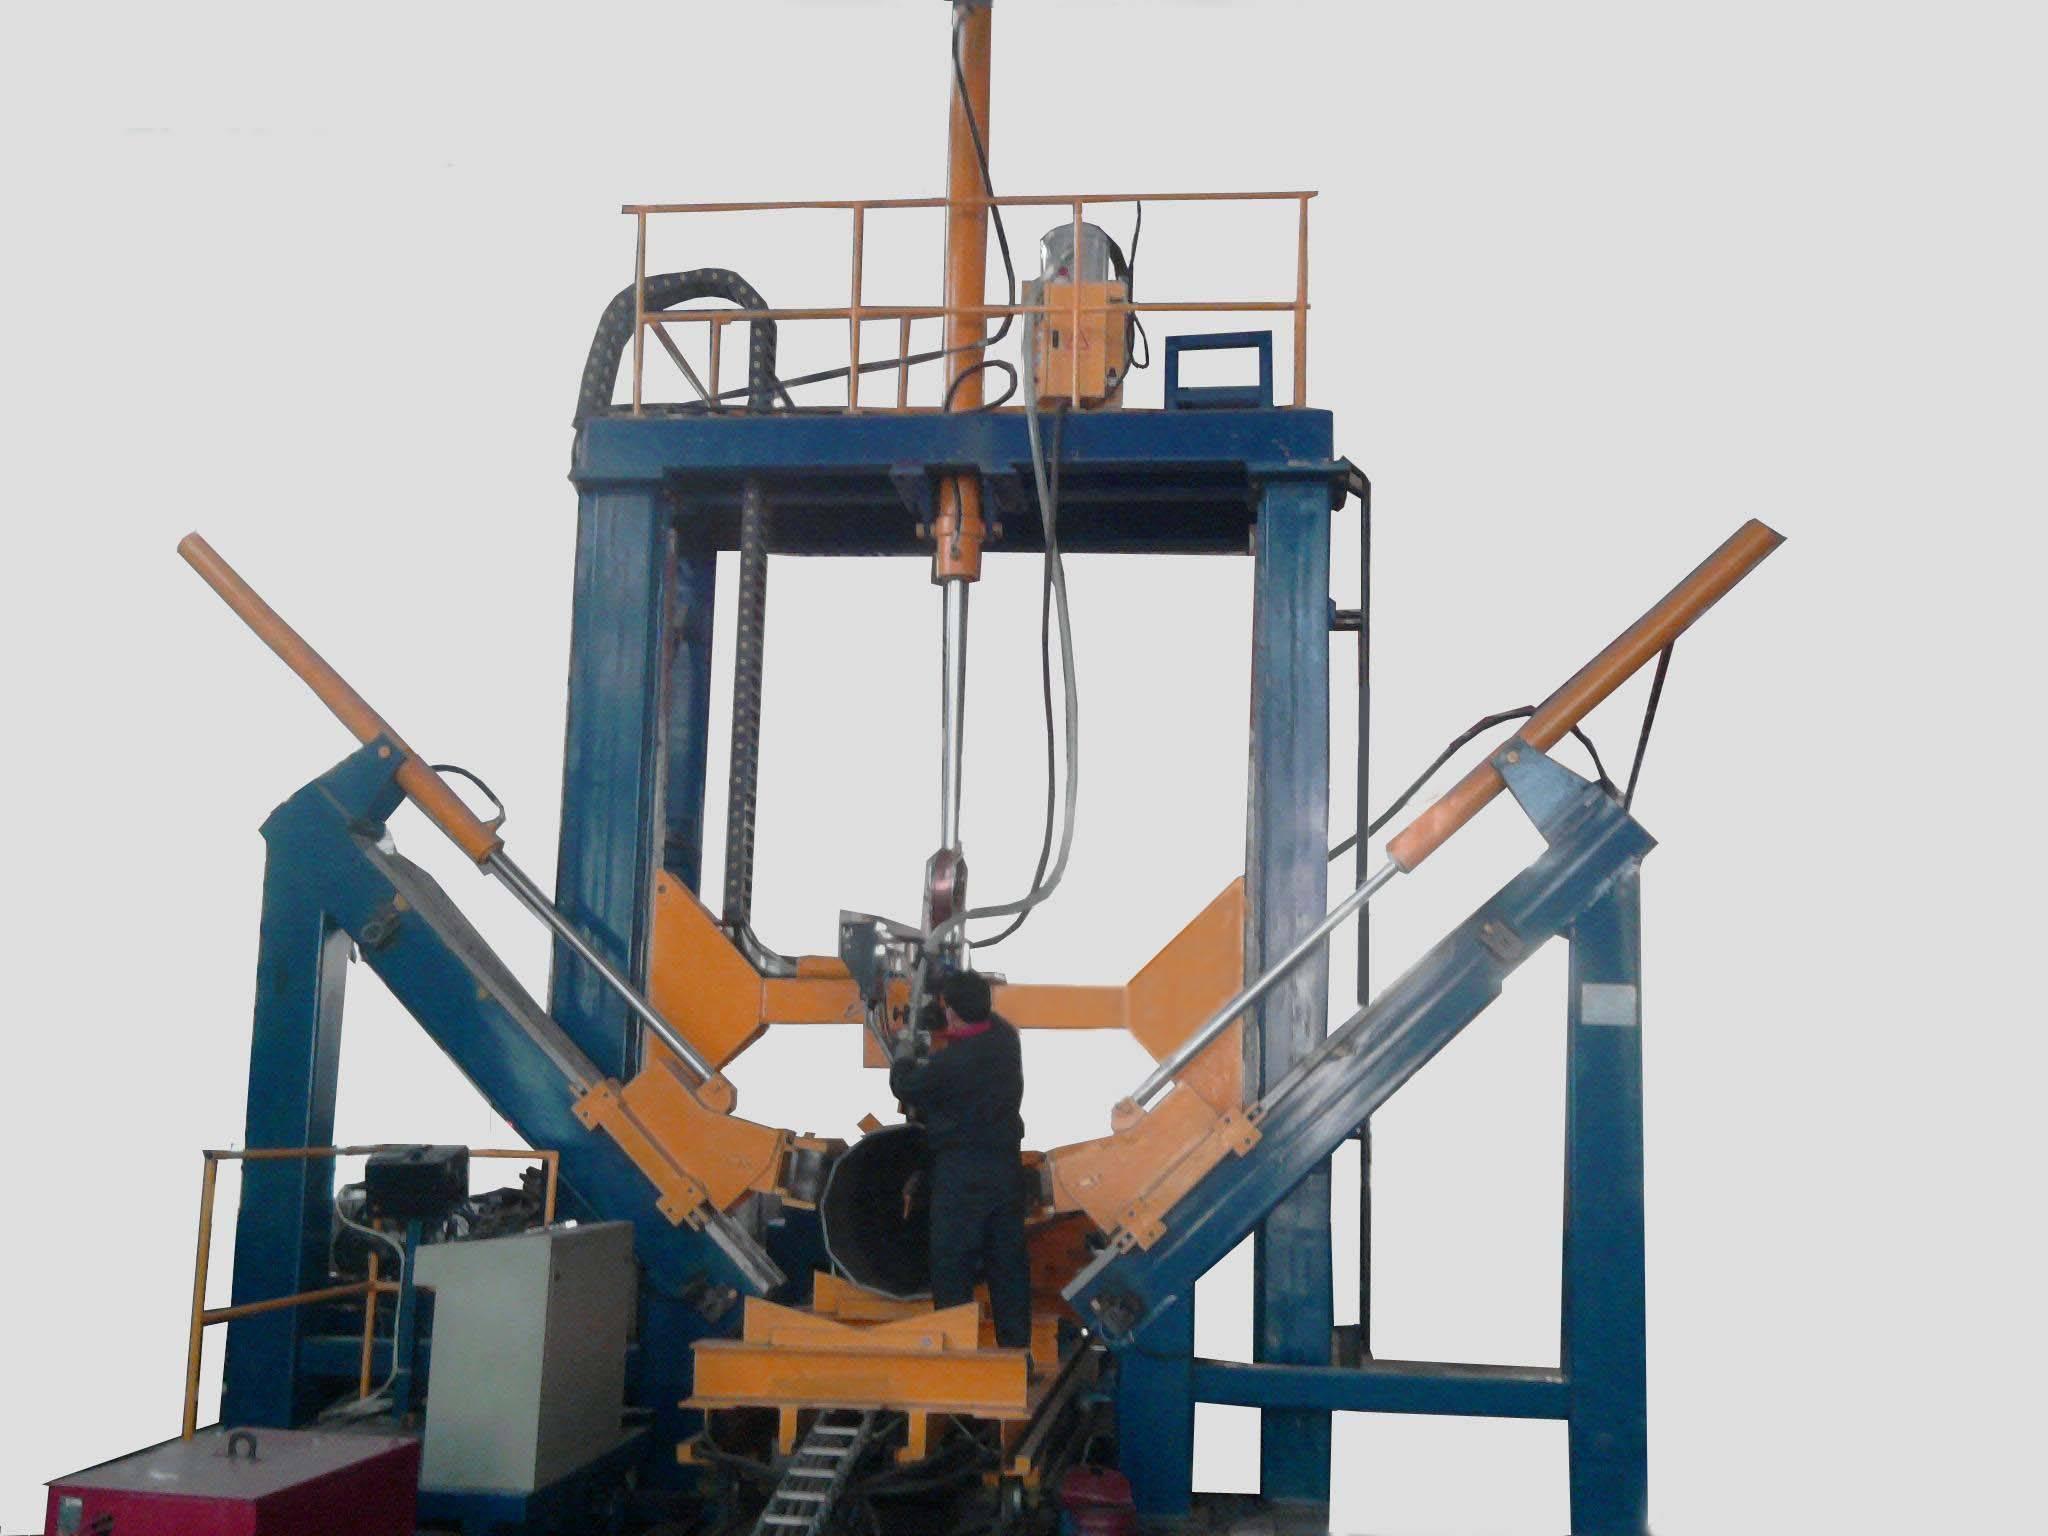 Pole welding machine